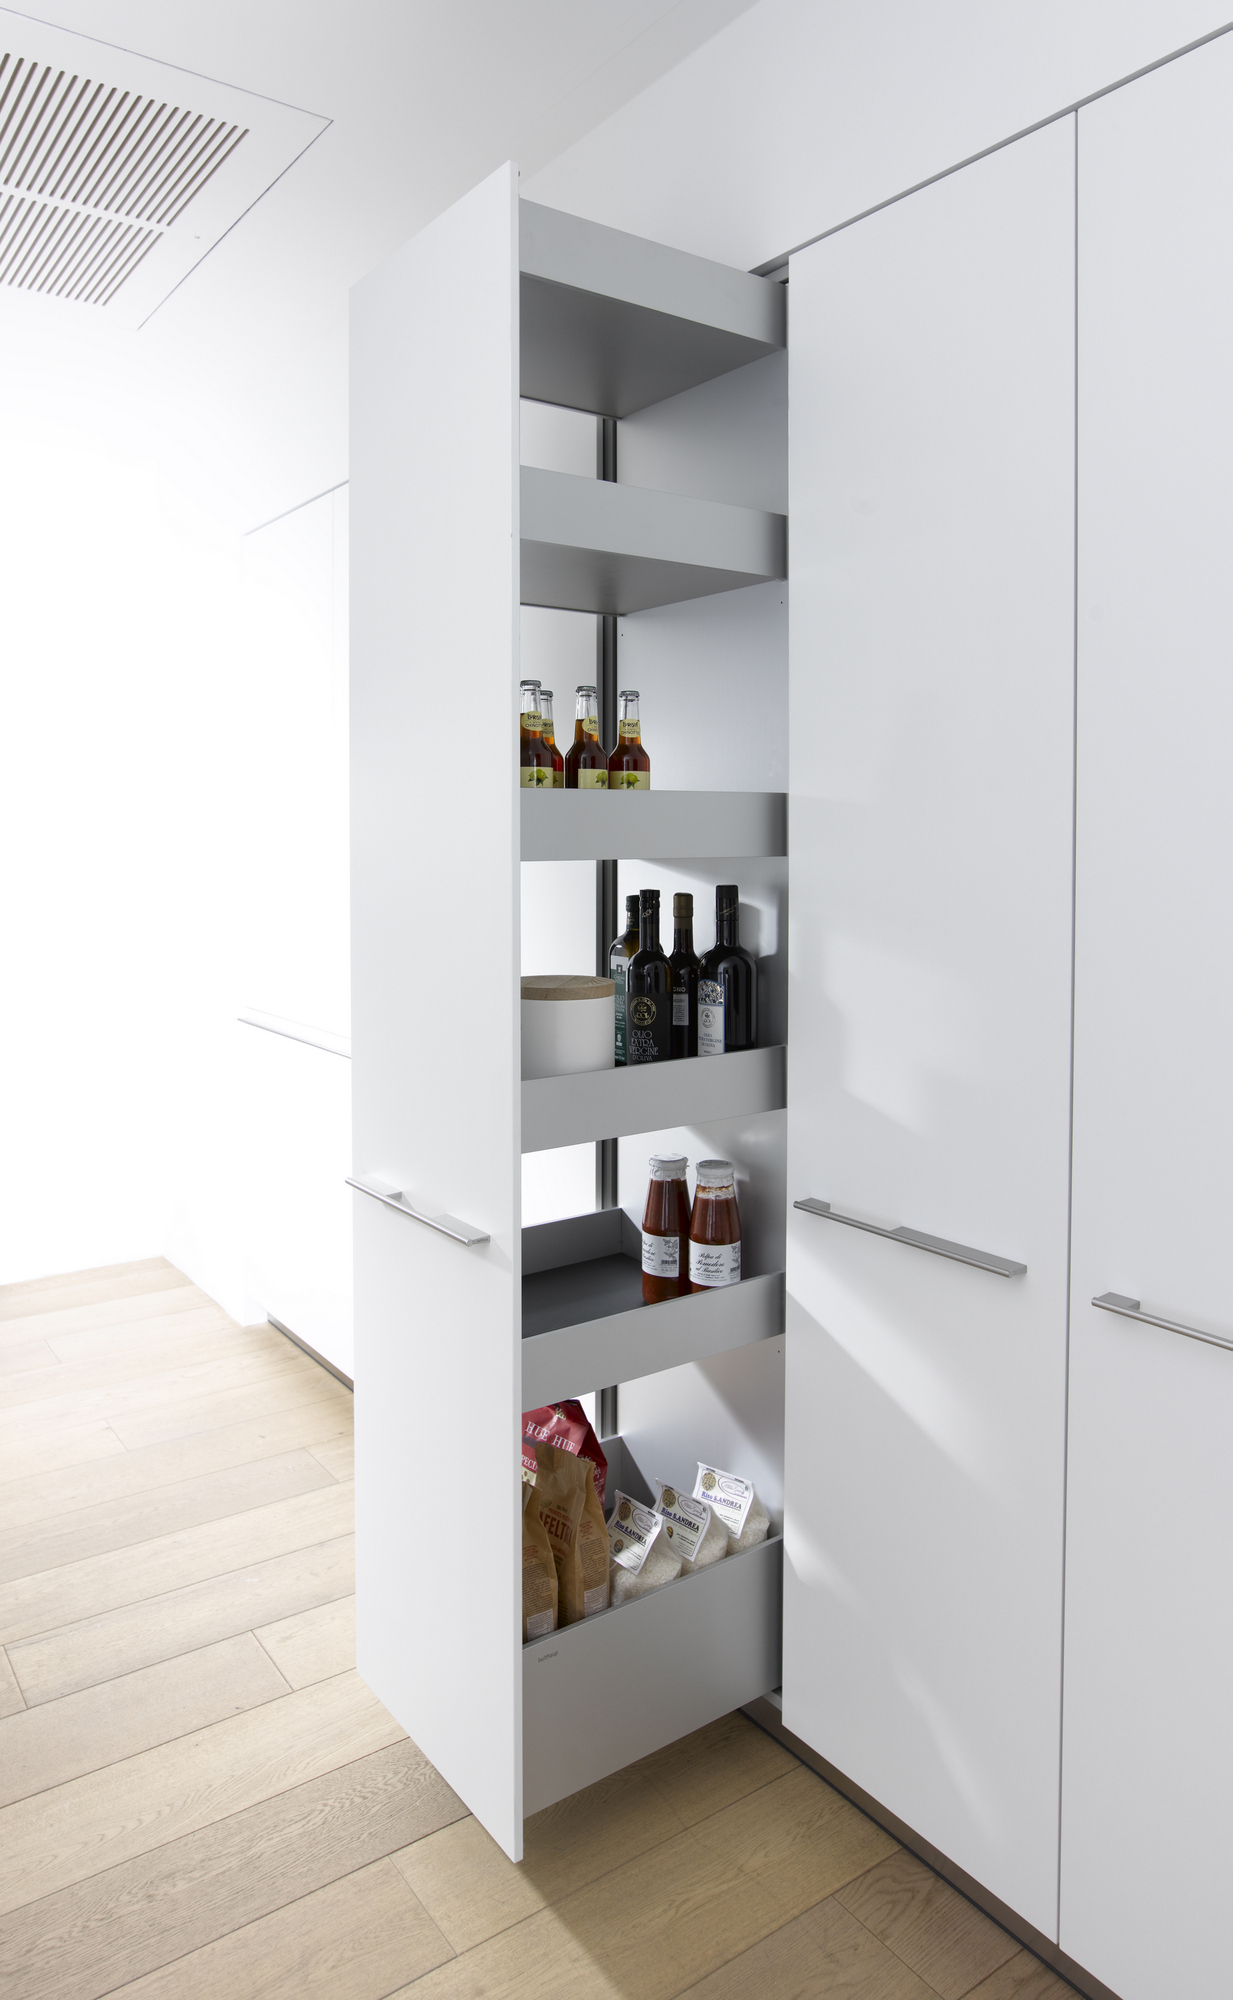 b3 | cucina in laminato by bulthaup - Laminato Per Cucina